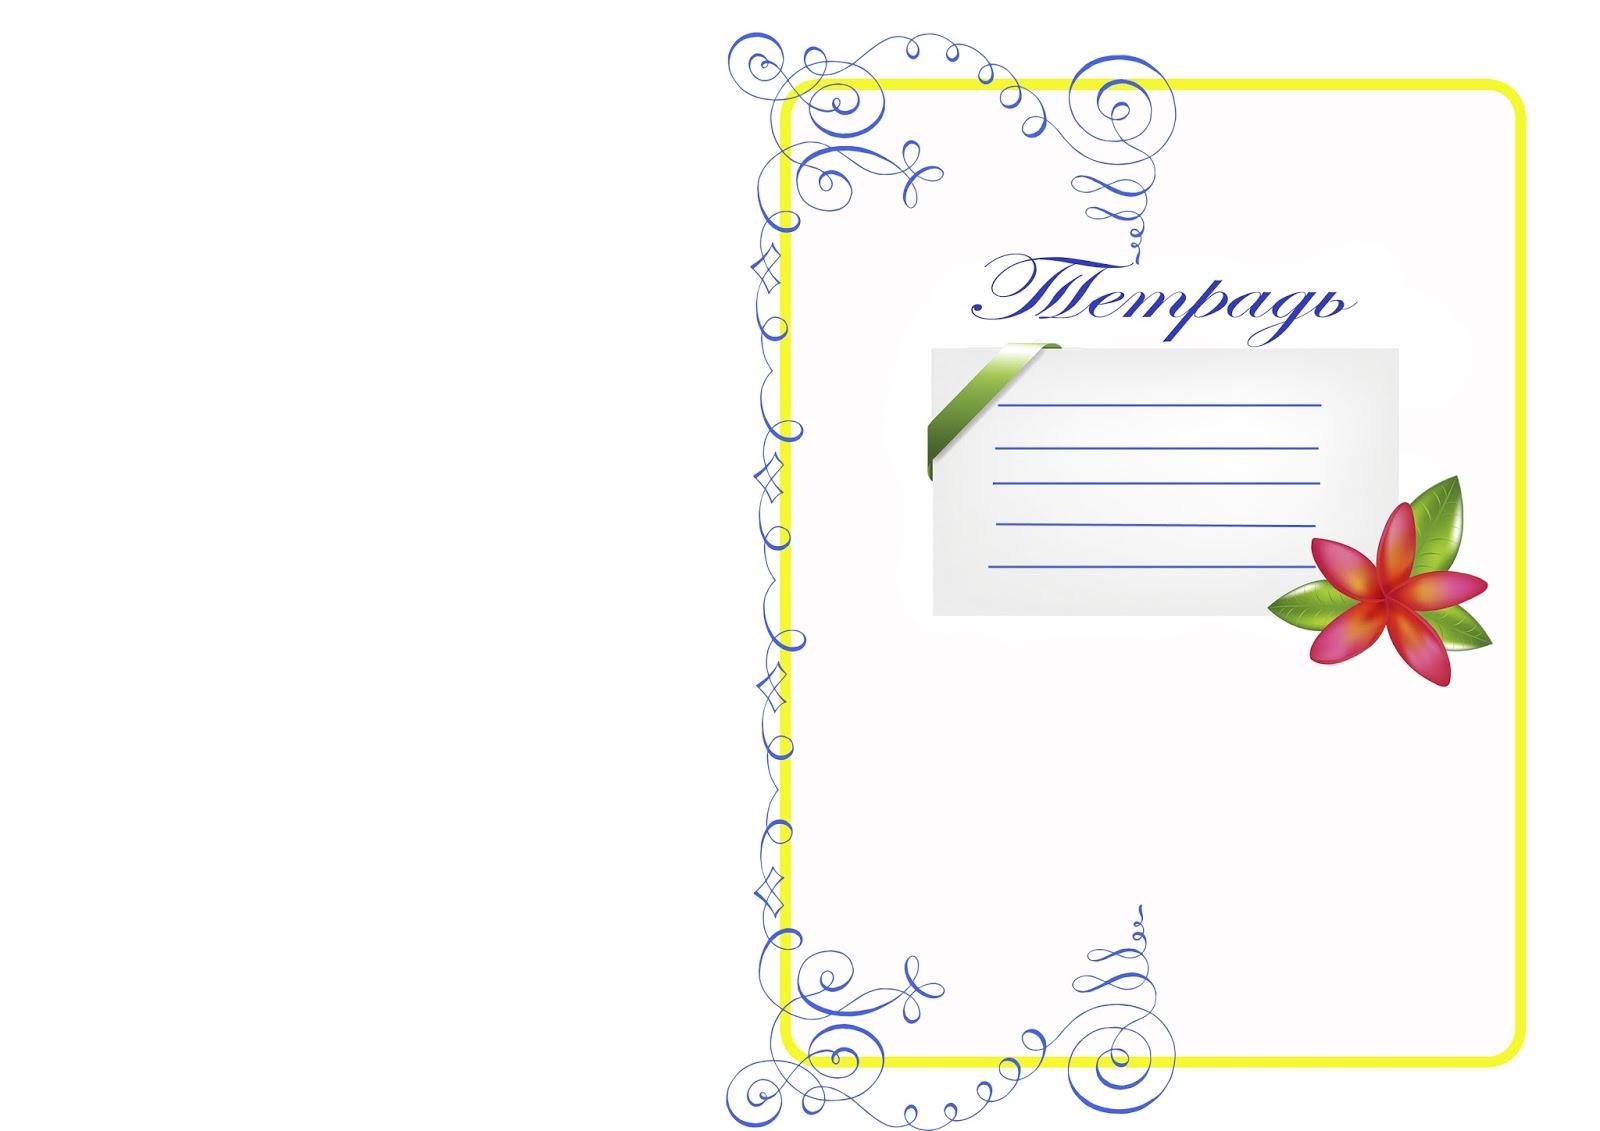 Картинки на обложку тетради красивые